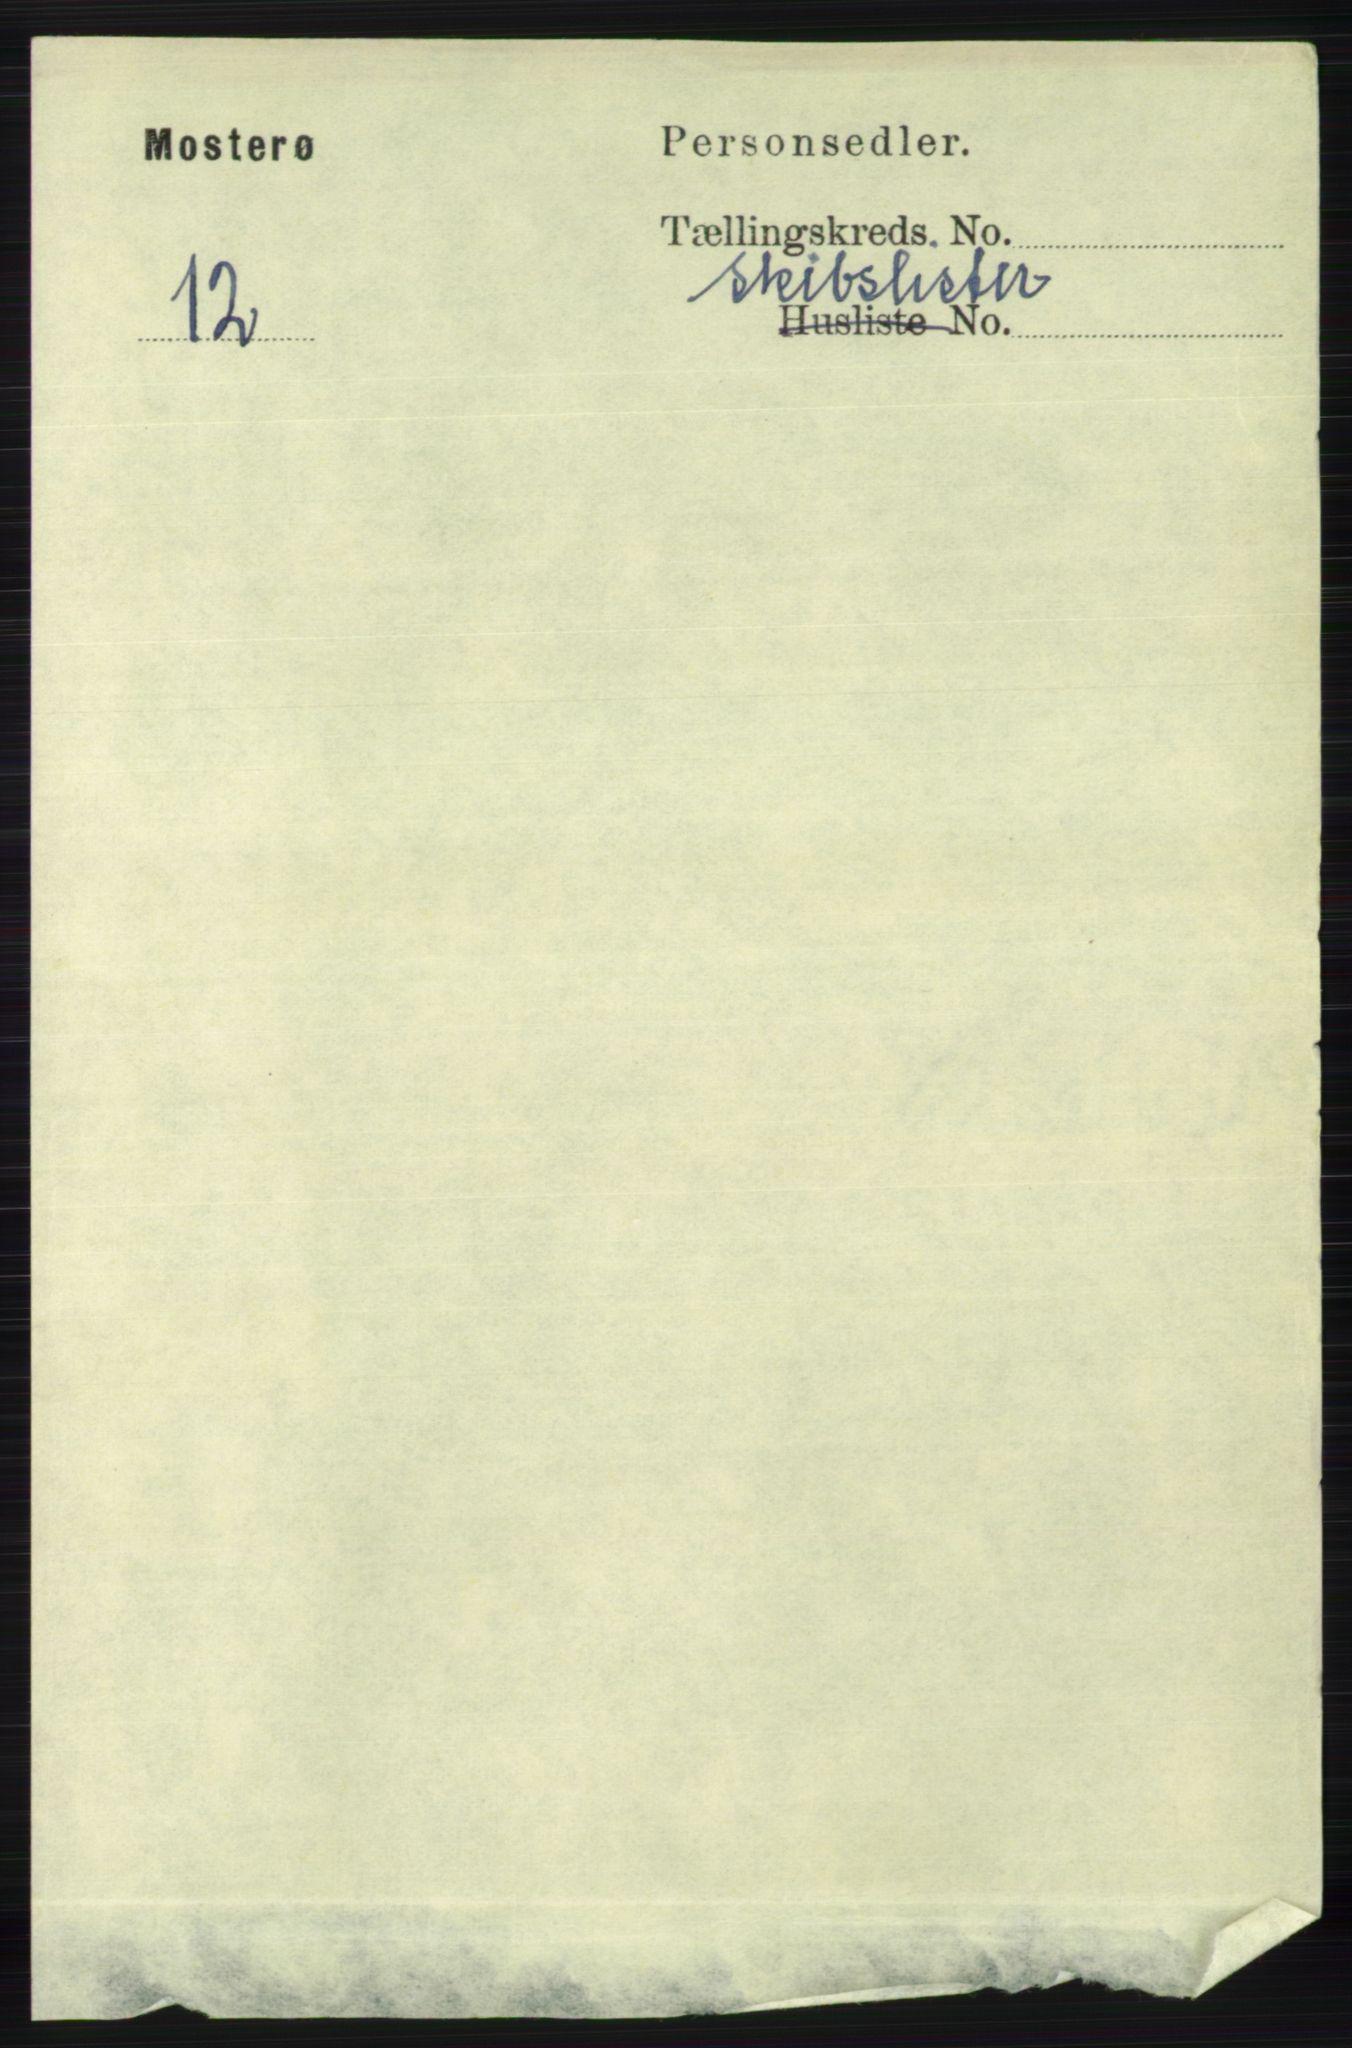 RA, Folketelling 1891 for 1143 Mosterøy herred, 1891, s. 1489